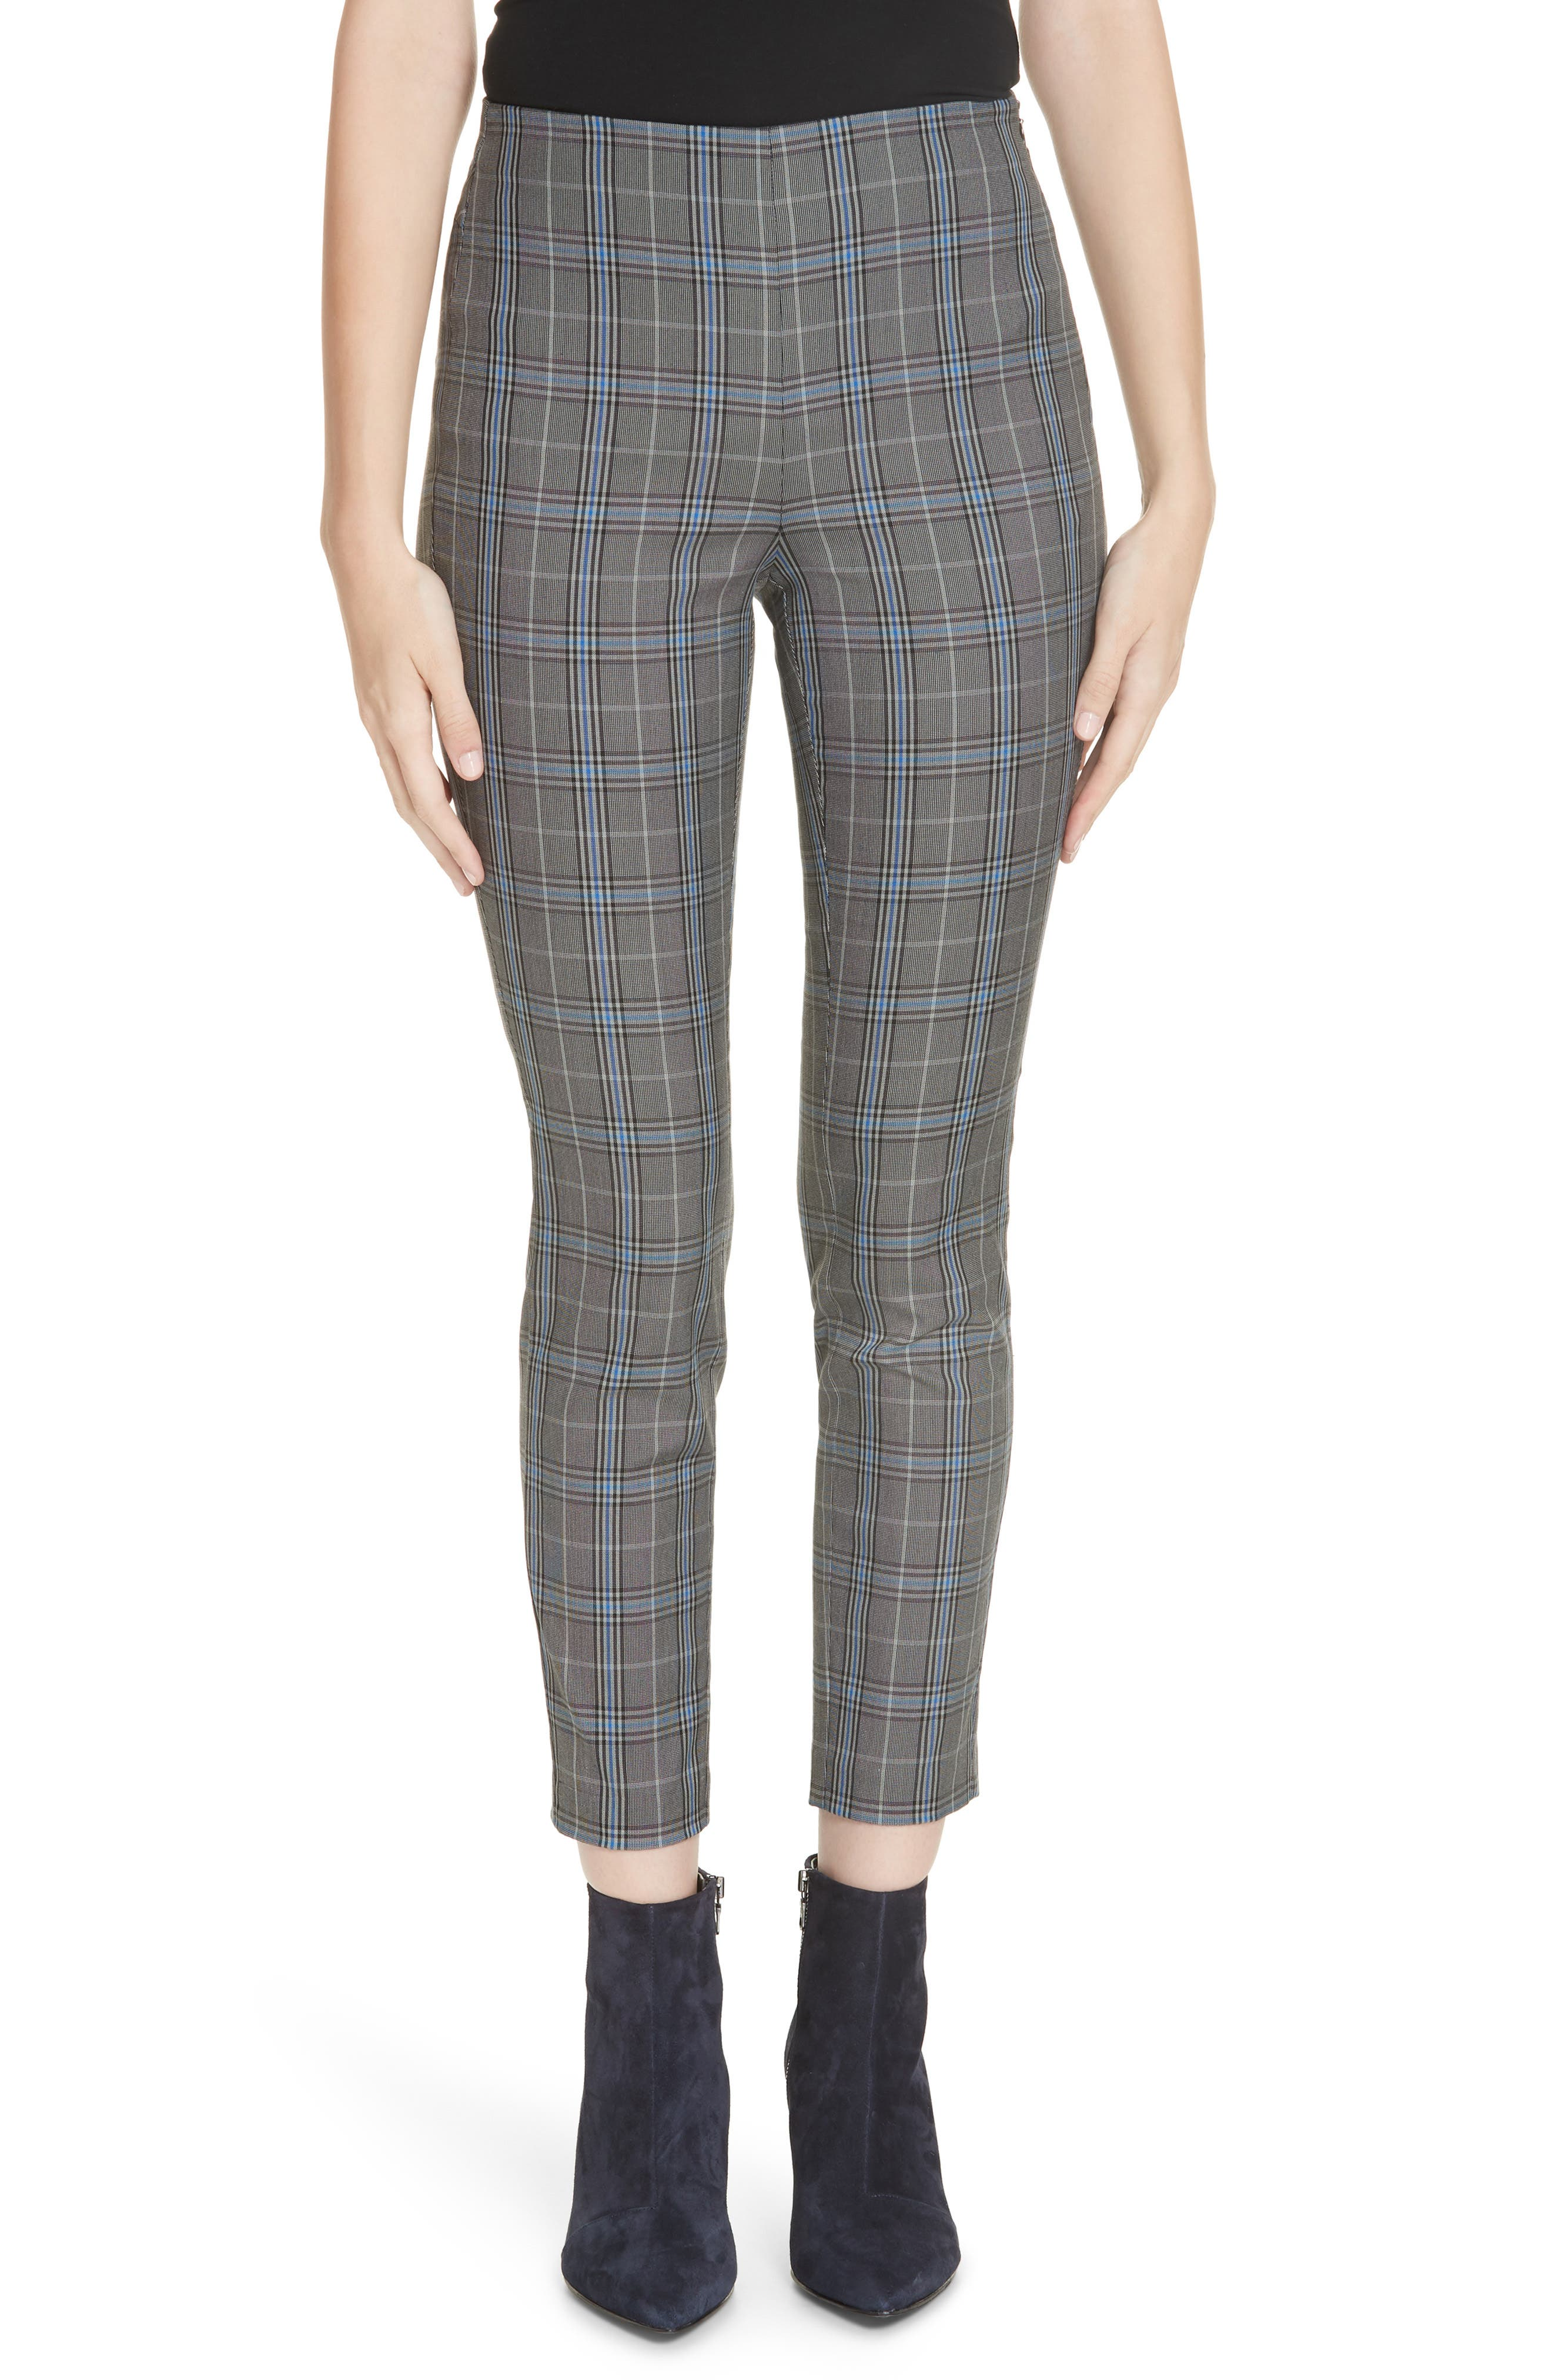 RAG & BONE Simone Plaid Crop Pants, Main, color, GREY MULTI